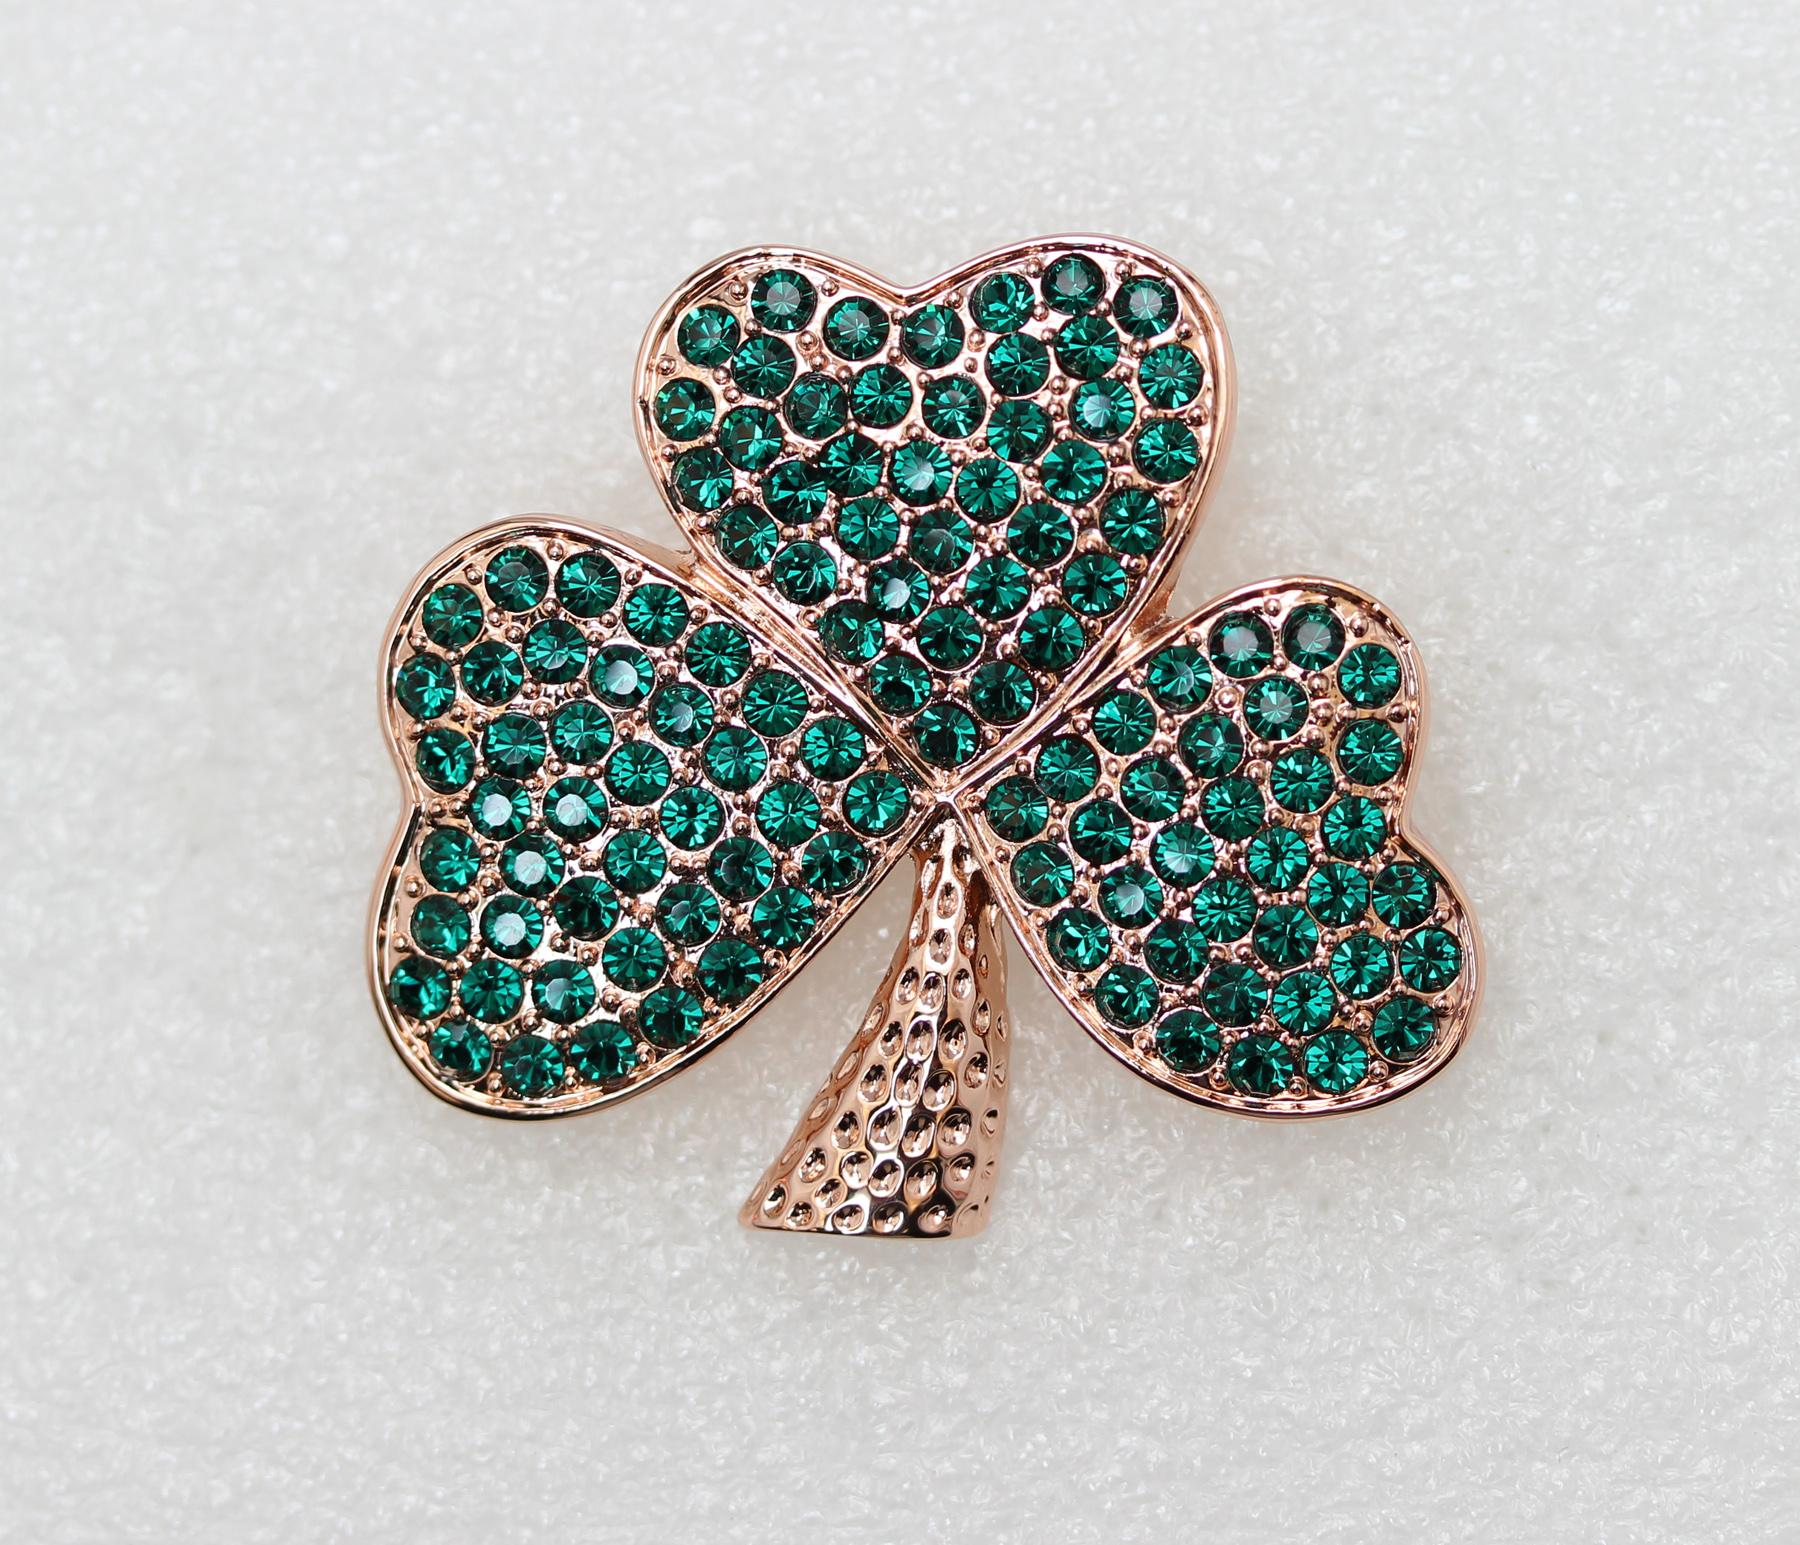 Emerald-Color-Green-Crystal-Shamrock-Clover-Leaf-Pin-Brooch-St-Patricks-Day thumbnail 3